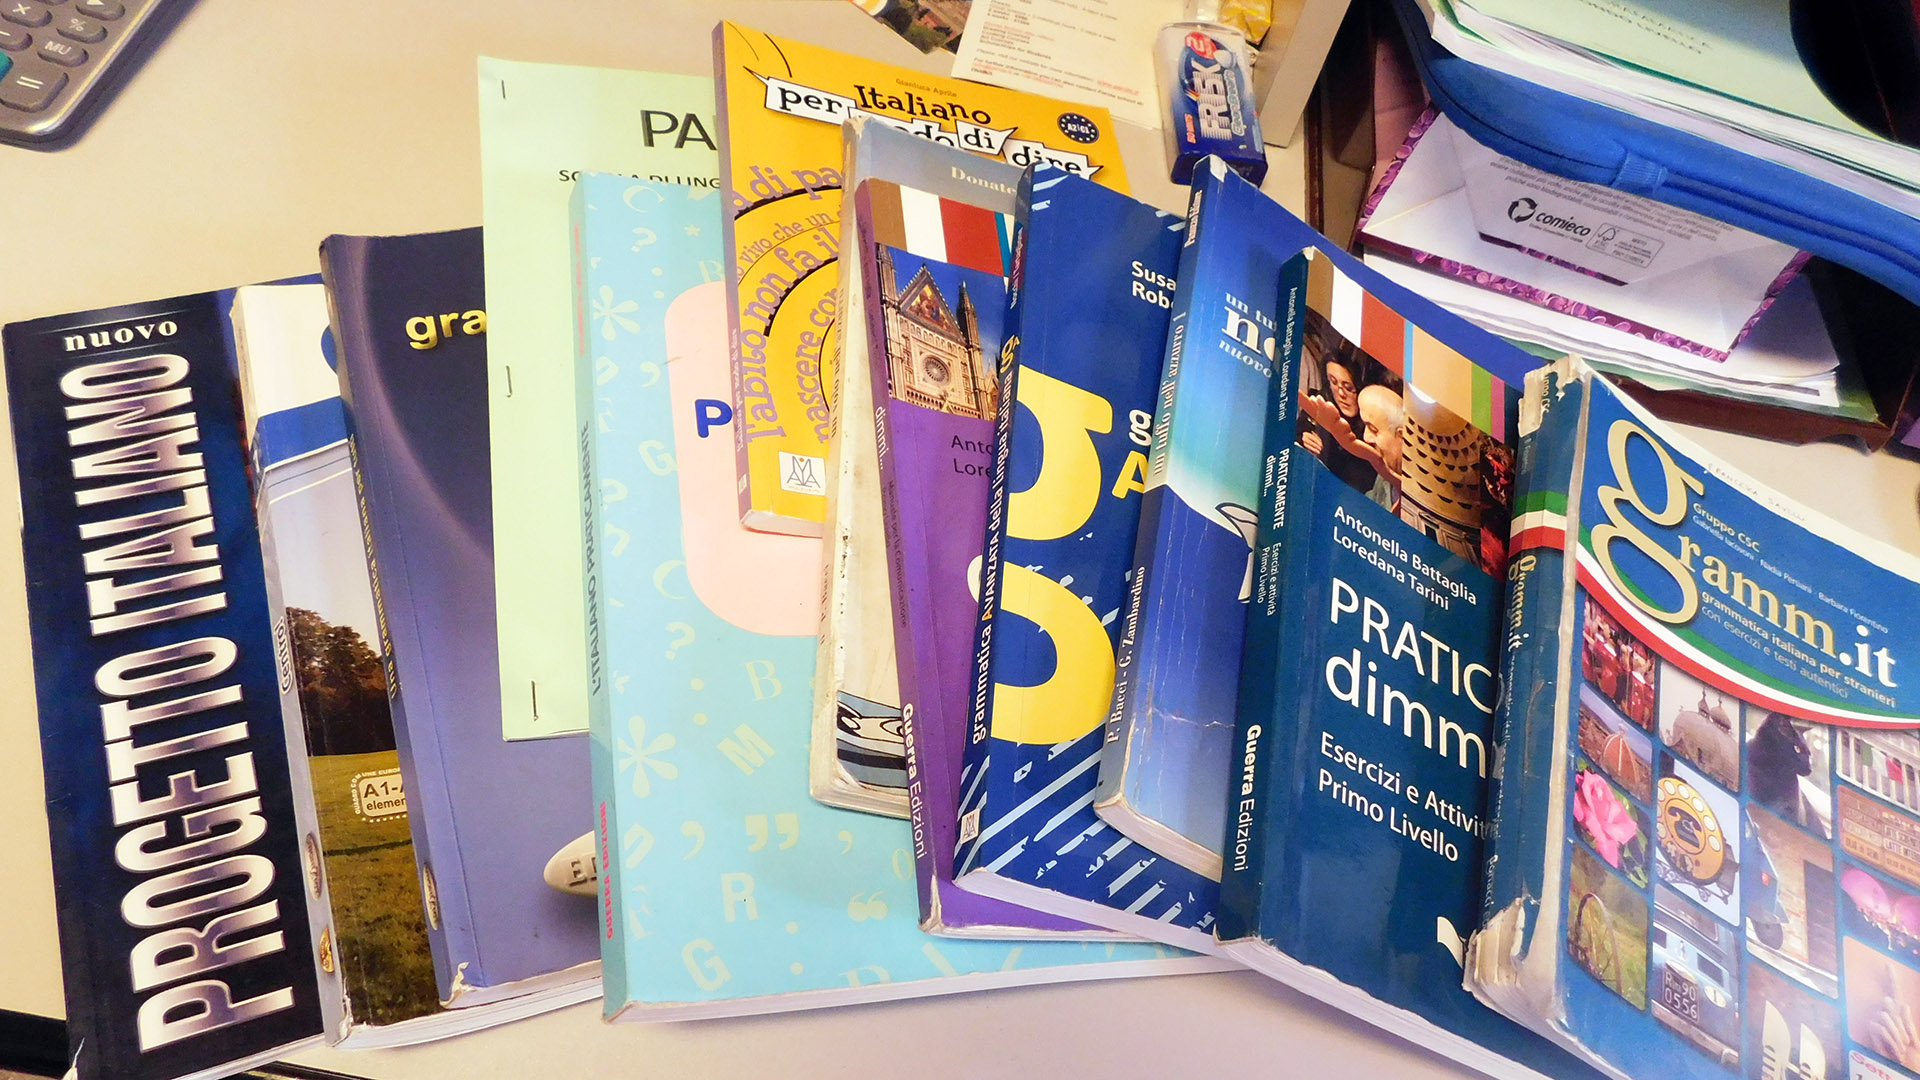 Books for Italian language teaching